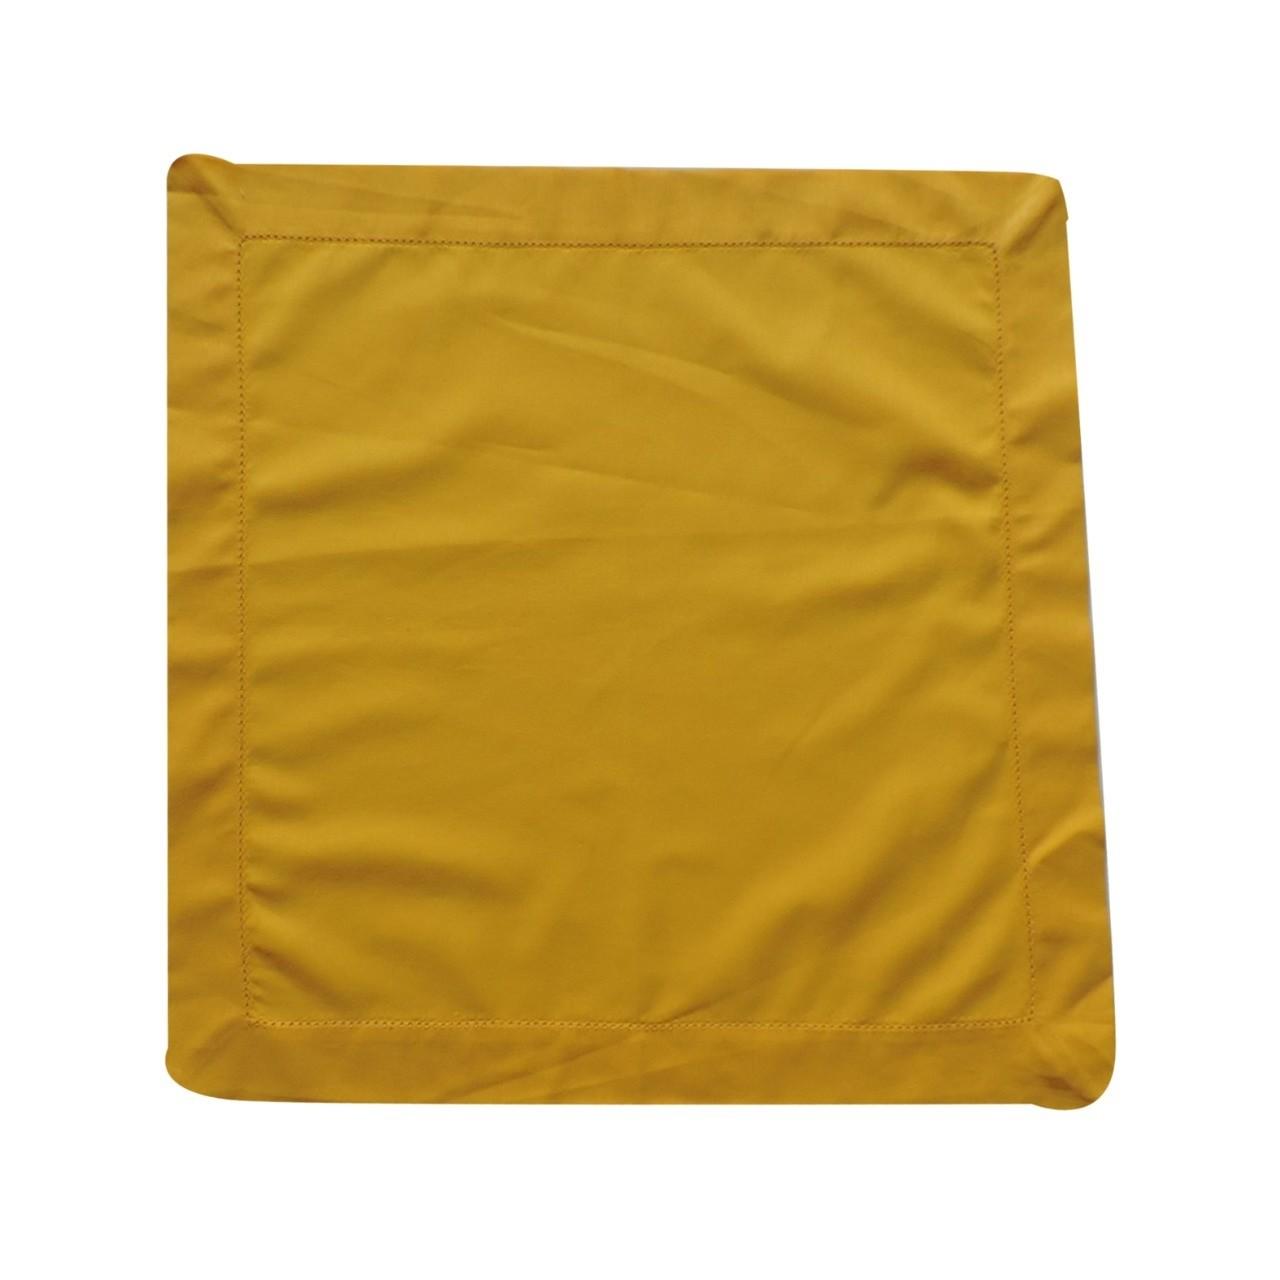 Guardanapo Ponto Aju 40x40cm Tecido Amarelo - Noemy Artesan